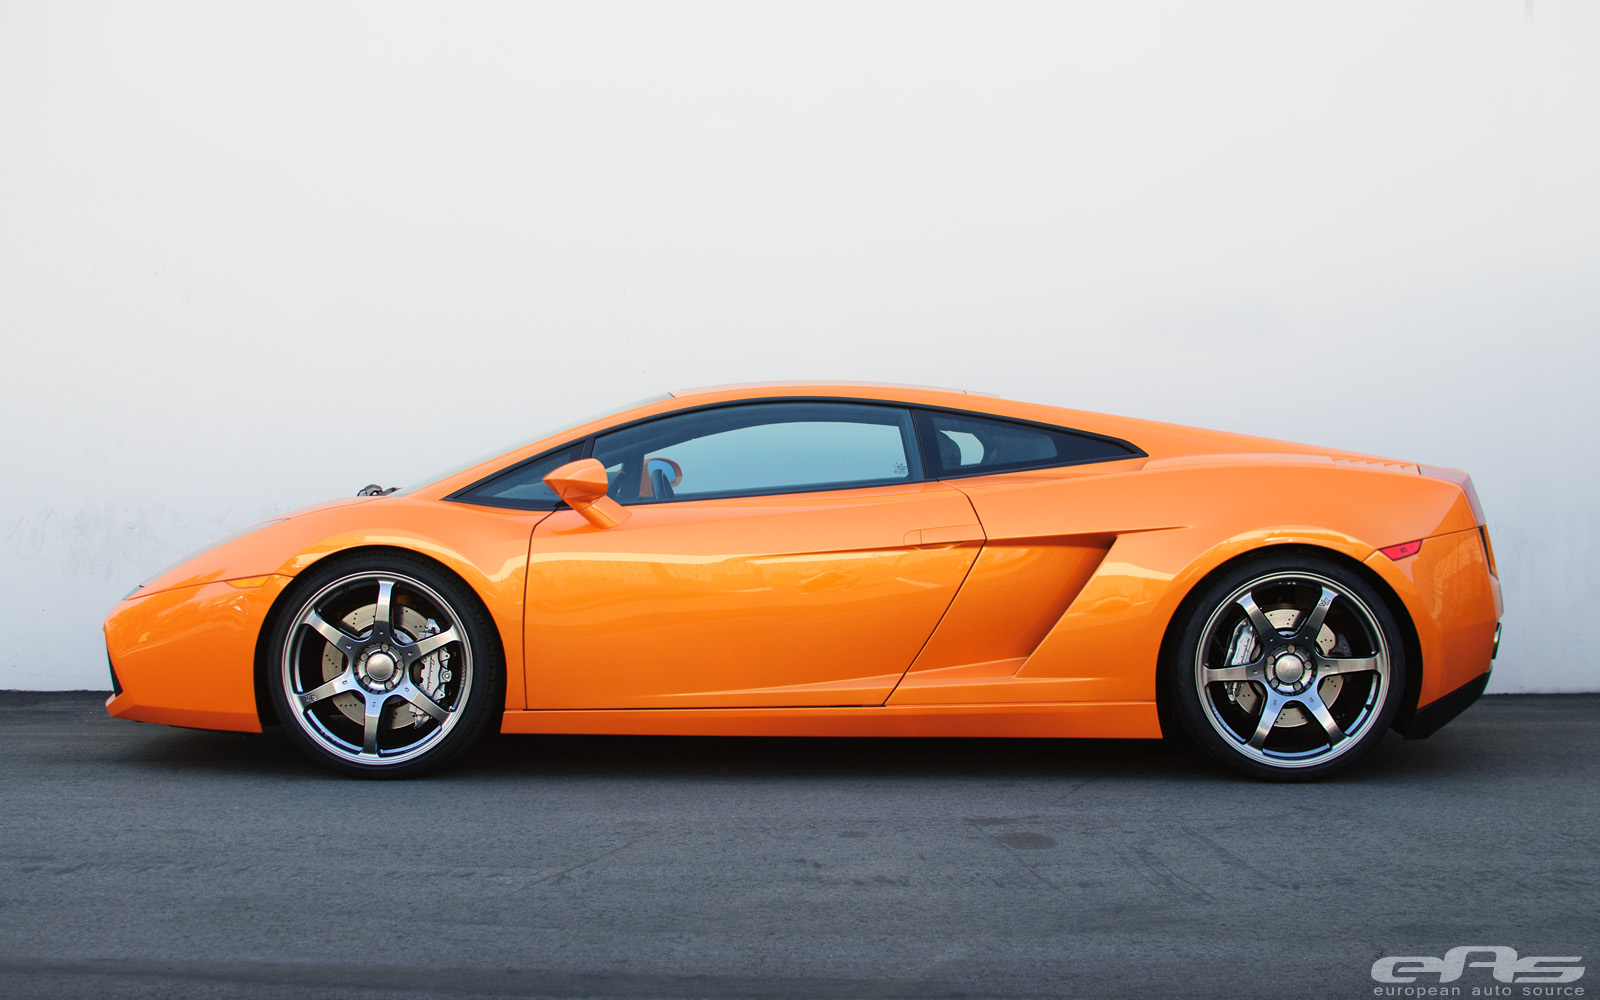 Orange Lamborghini Gallardo on Volk VR.G2 Wheels   BMW Performance on gold mercedes, gold lamborghini convertible, gold bmw, gold bugatti, gold lamborghini gallardo, gold koenigsegg agera r, gold lamborghini reventon, gold lamborghini elemento, gold lamborghini countach, gold bentley, gold ferrari, gold honda accord, gold rolls-royce phantom, gold and diamond lamborghini, gold aston martin, gold lamborghini murcielago, gold lamborghini diablo, gold lamborghini egoista, gold toyota camry, gold camaro,